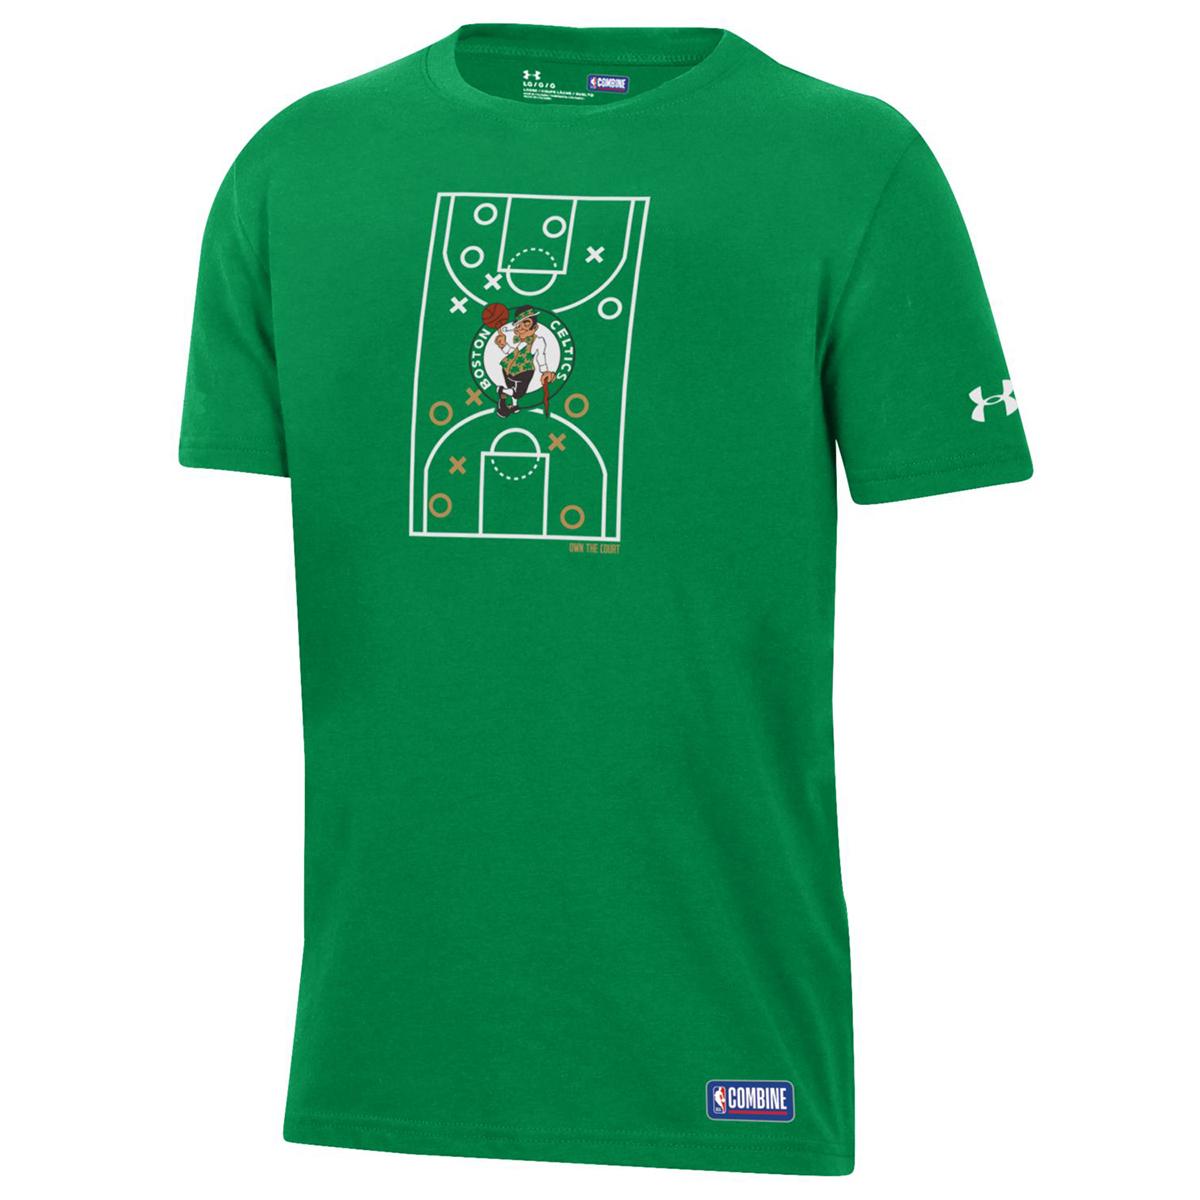 Under Armour Big Boys' Boston Celtics Combine Full Court Performance Short-Sleeve Tee - Green, XL